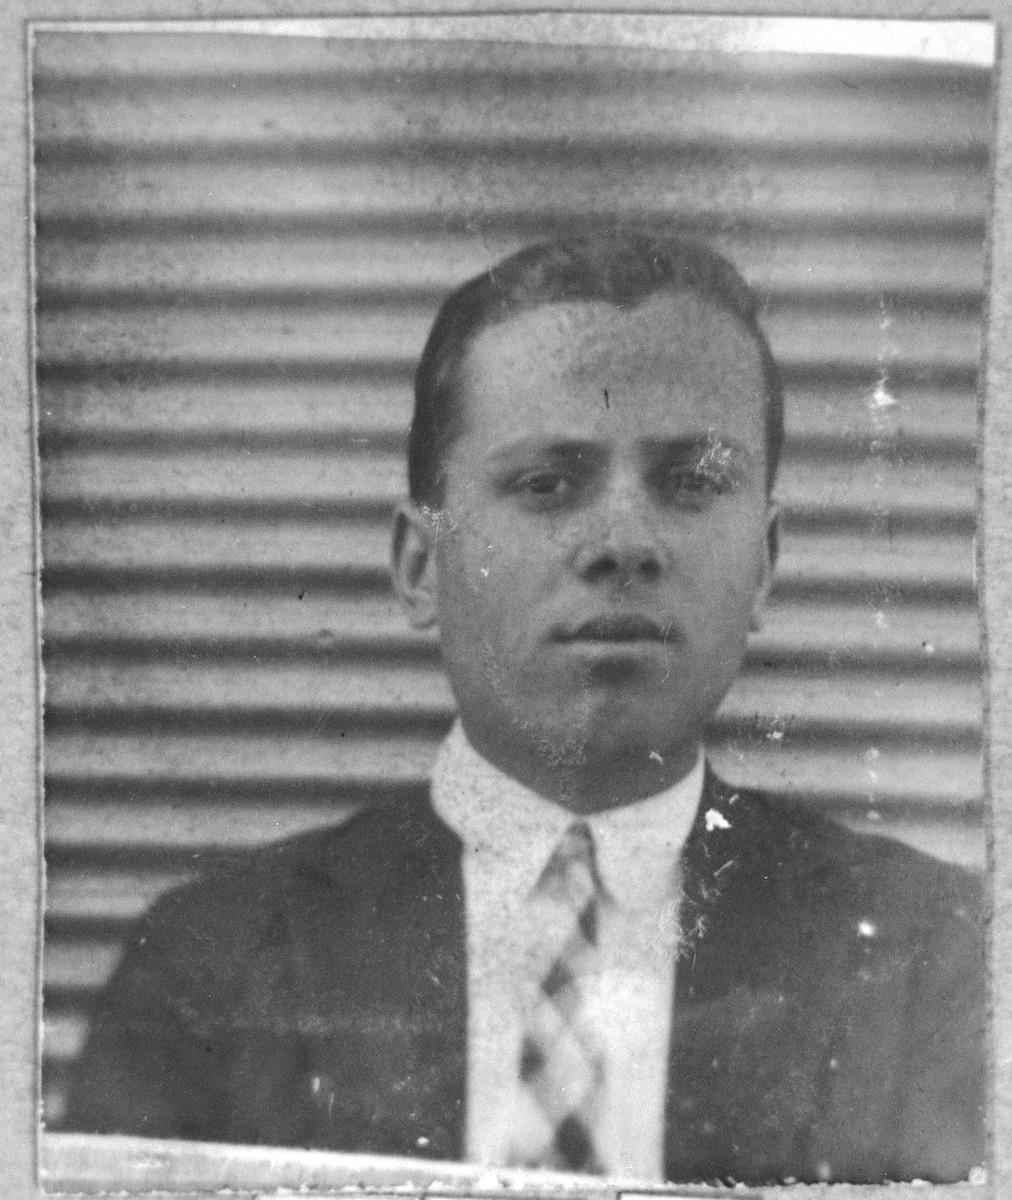 Portrait of Mordechai Russo, son of Isak Russo.  He lived at Ferizovatska 30 in Bitola.